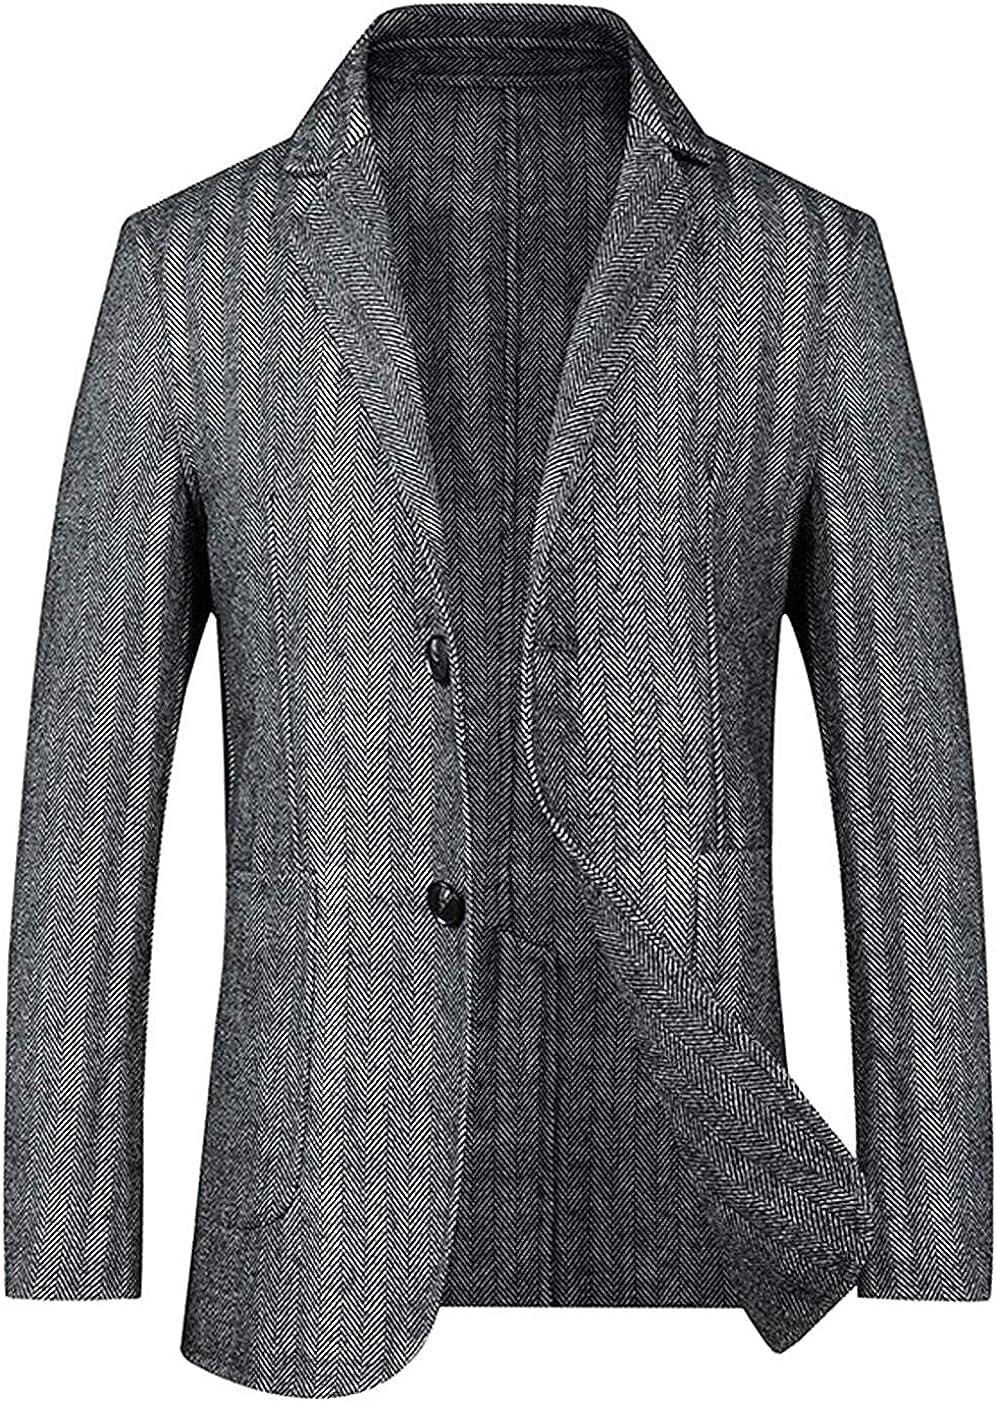 Men's 2 Button Herringbone Wool Blend Blazer Jacket Sport Coat